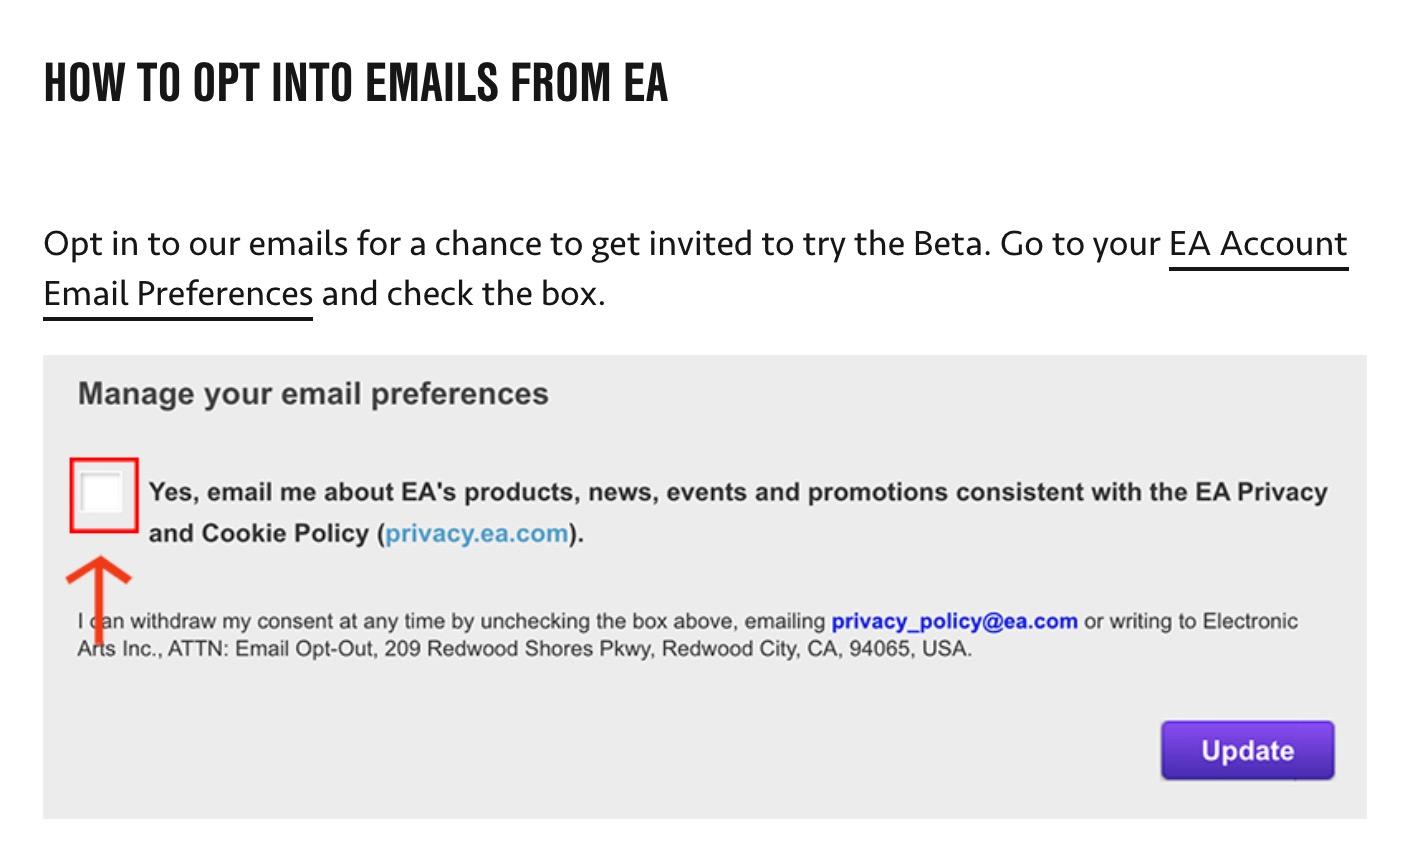 FIFA 21 beta access emails